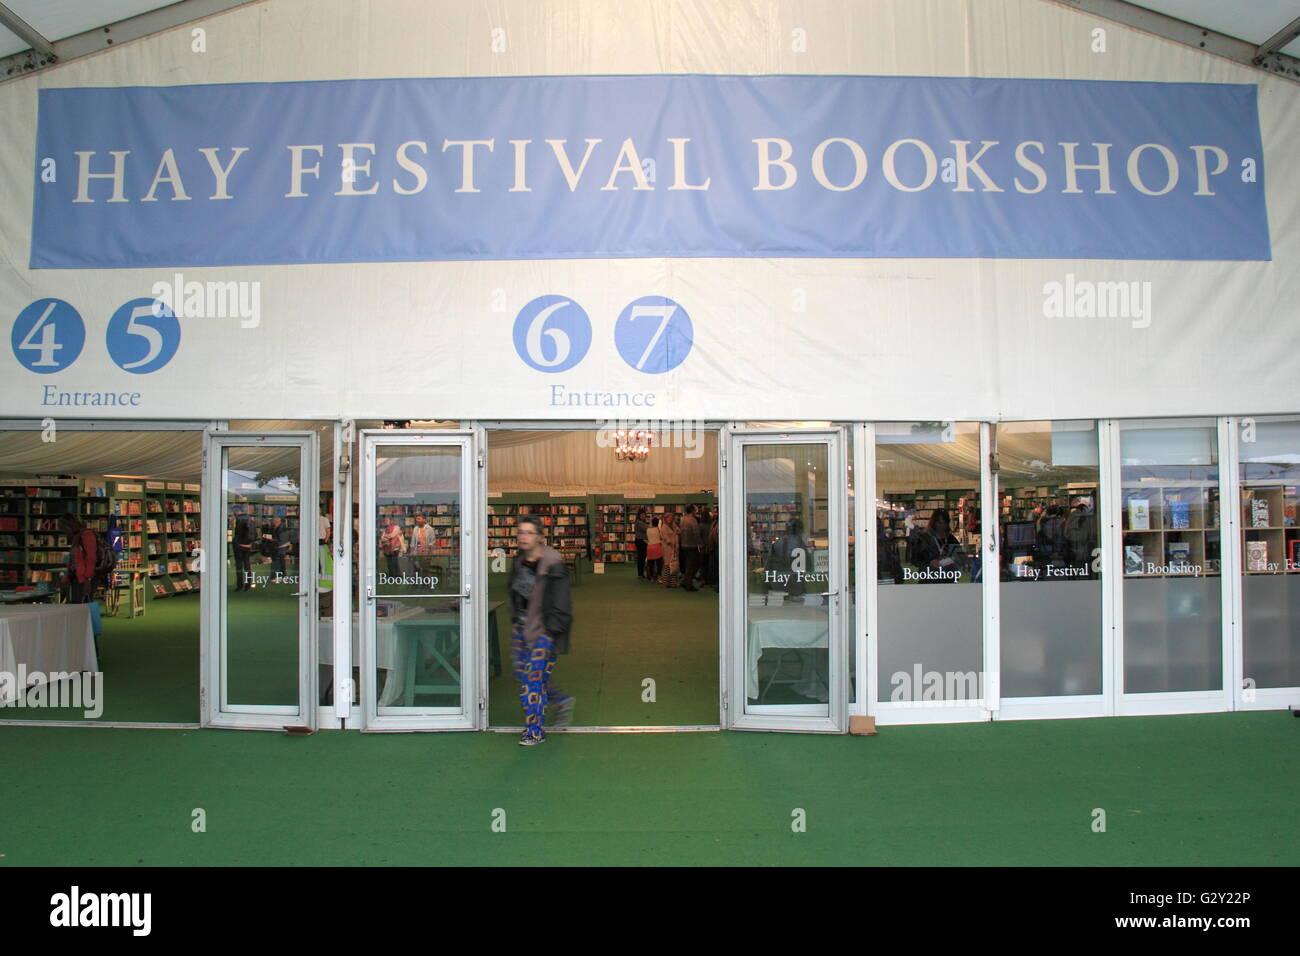 Bookshop, Hay Festival 2016, Hay-on-Wye, Brecknockshire, Powys, Wales, Great Britain, United Kingdom, UK, Europe - Stock Image